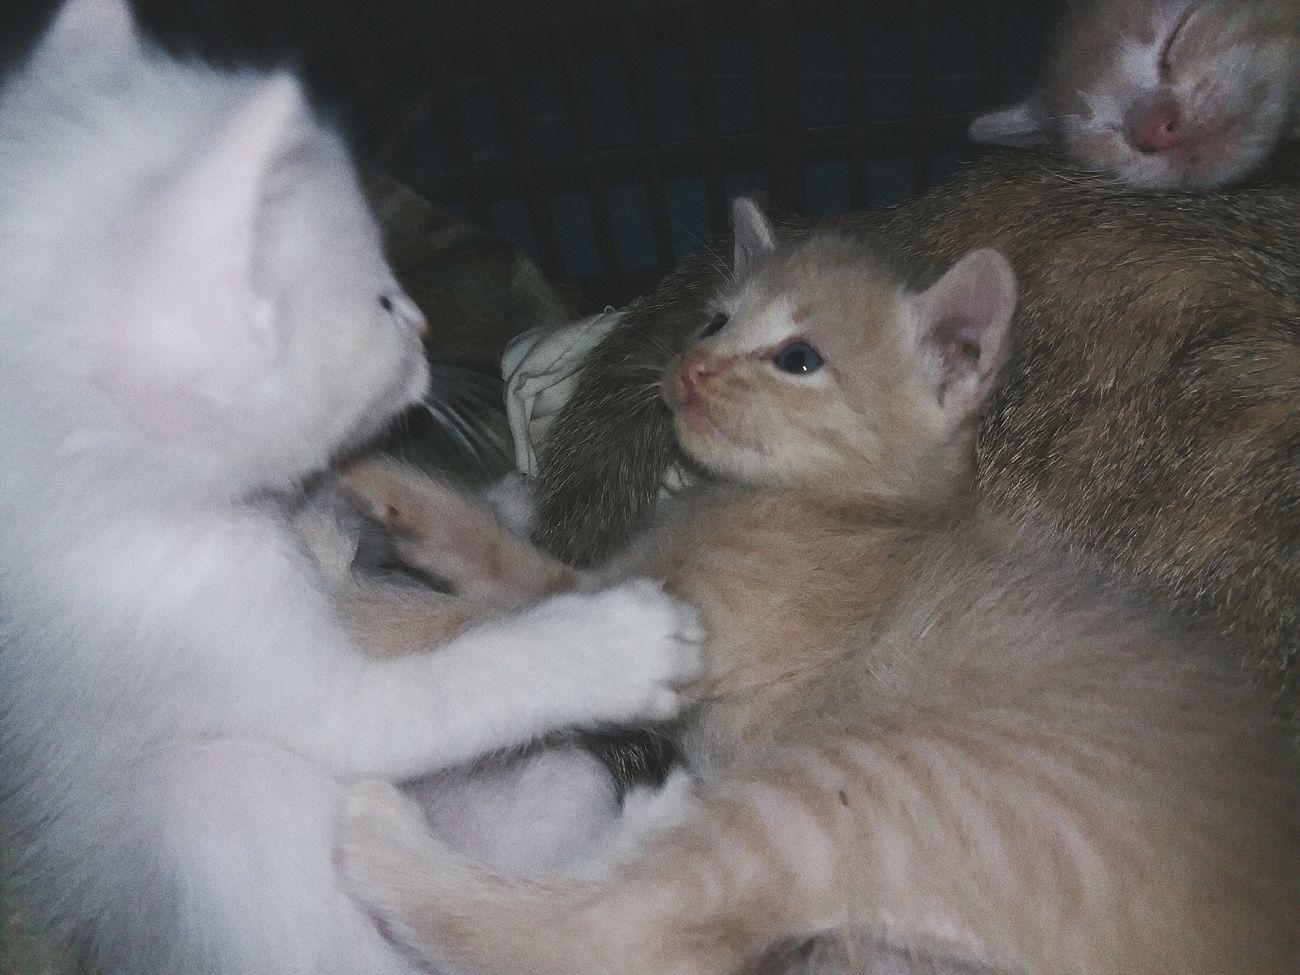 Cat Animal Babycat Animal Themes Domestic Animals